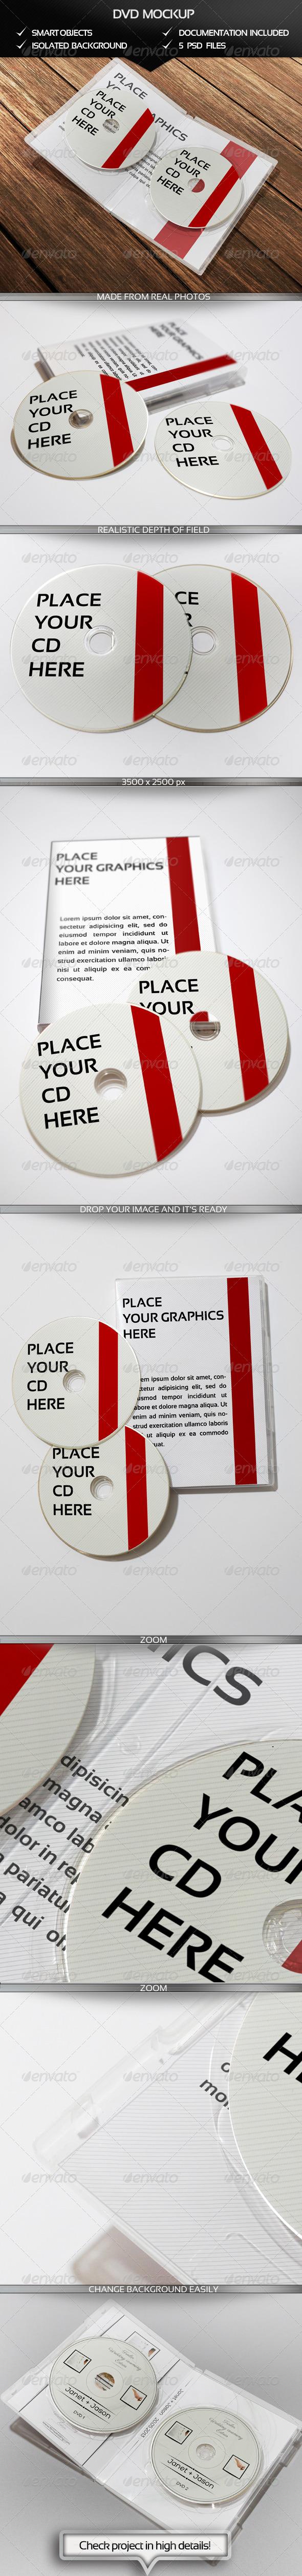 GraphicRiver DVD Mockup 4534121